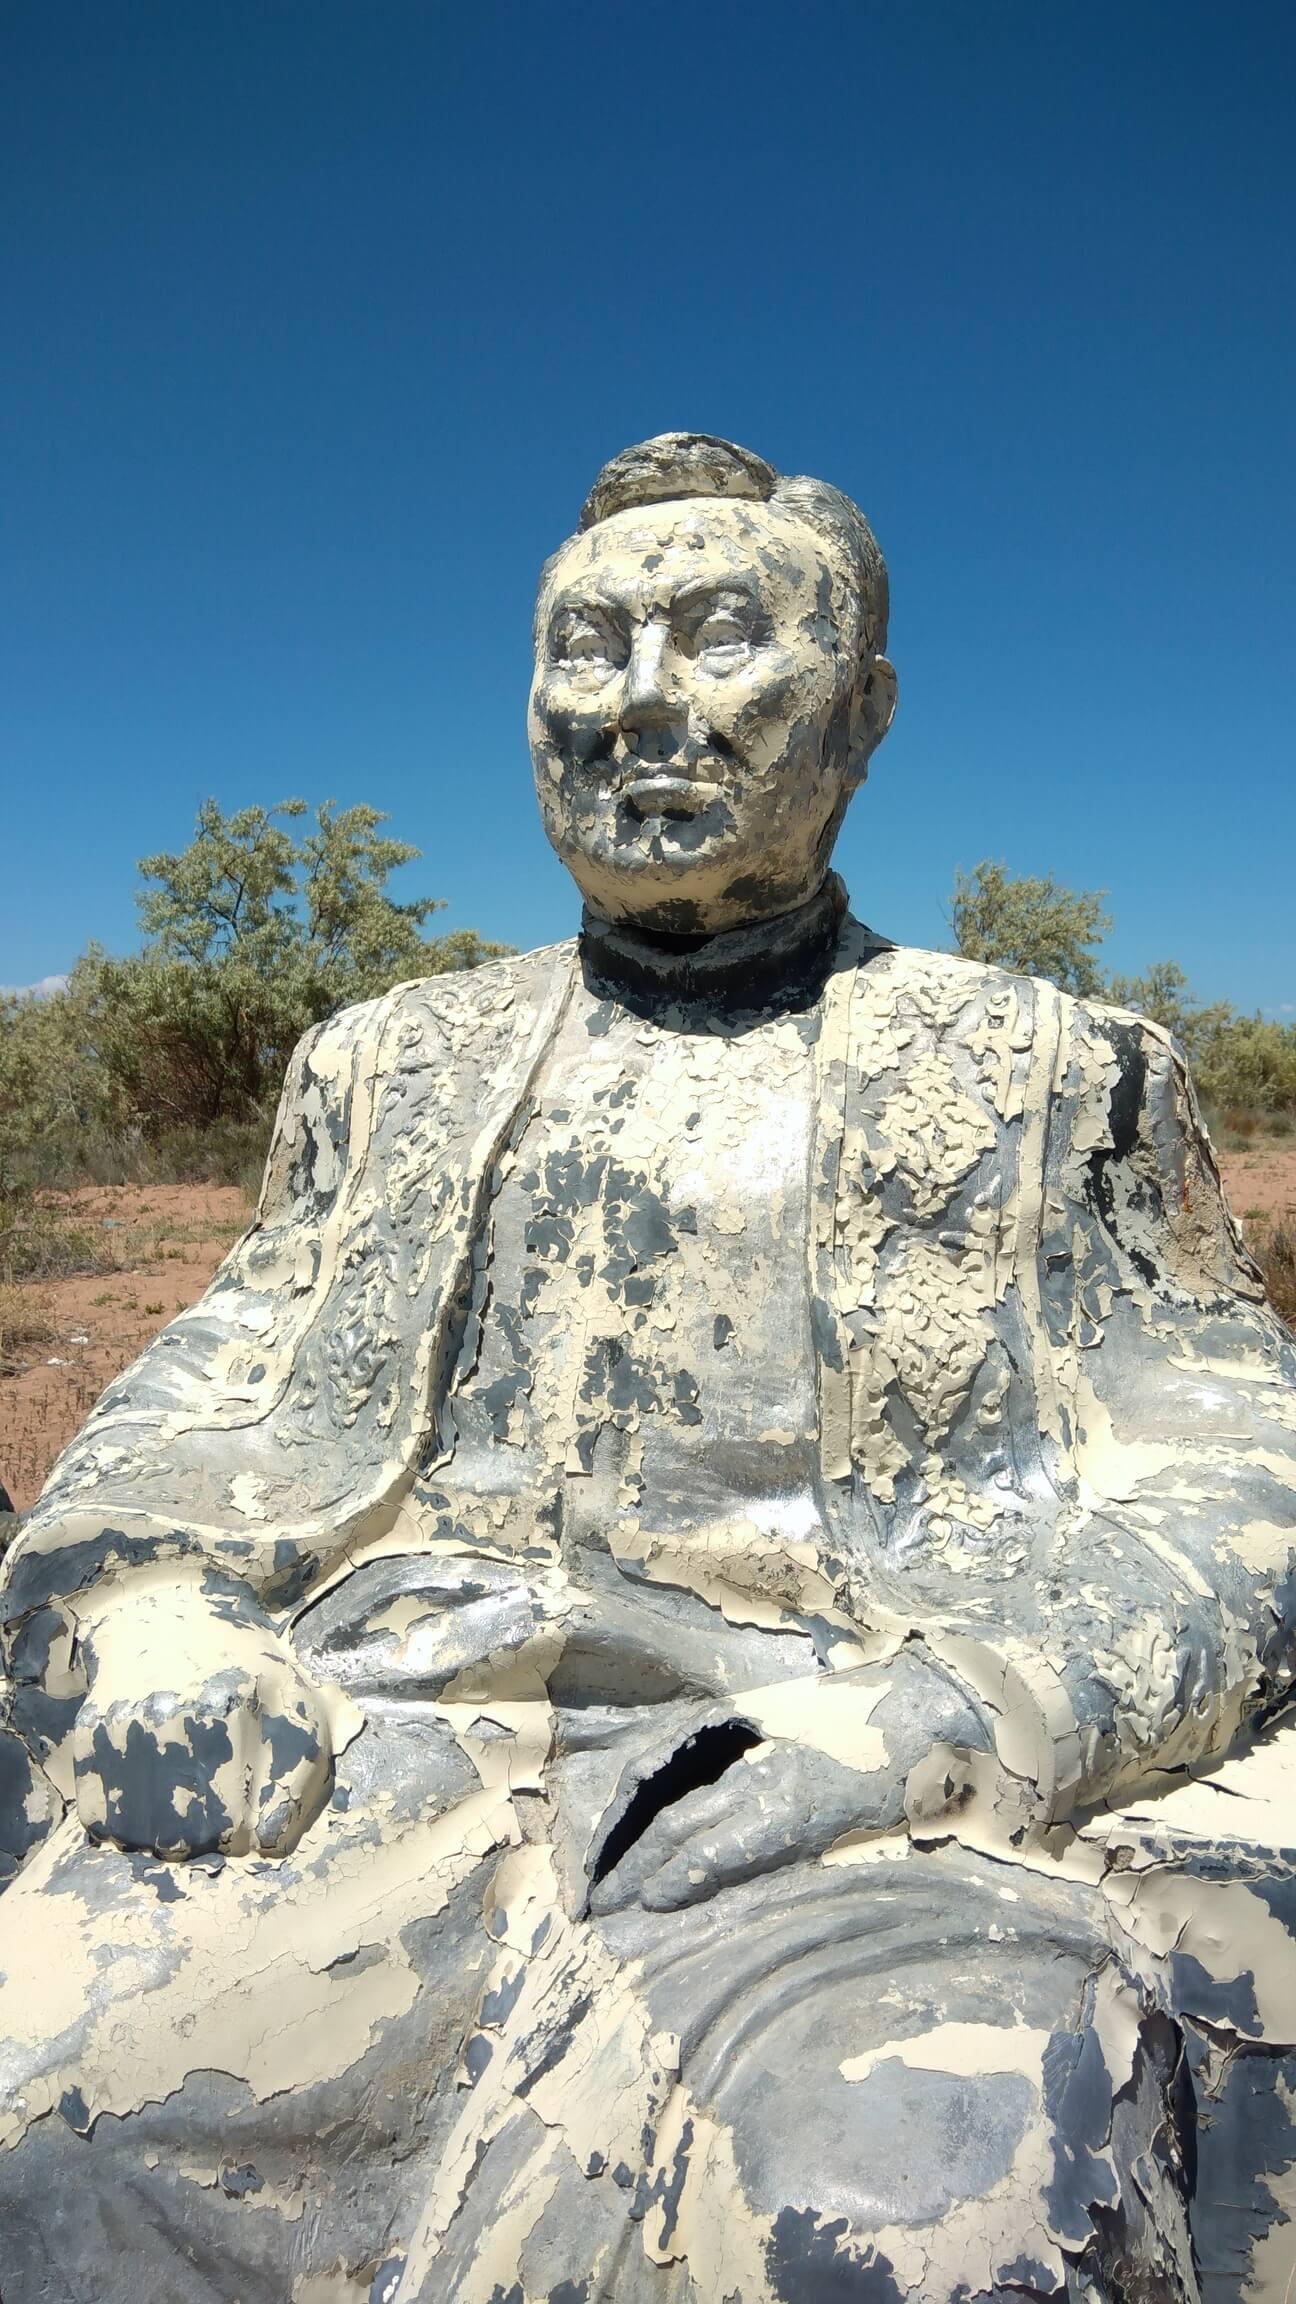 Statue Président Kazakhstan Nazarbaïev Issyk-Koul Kirghizstan